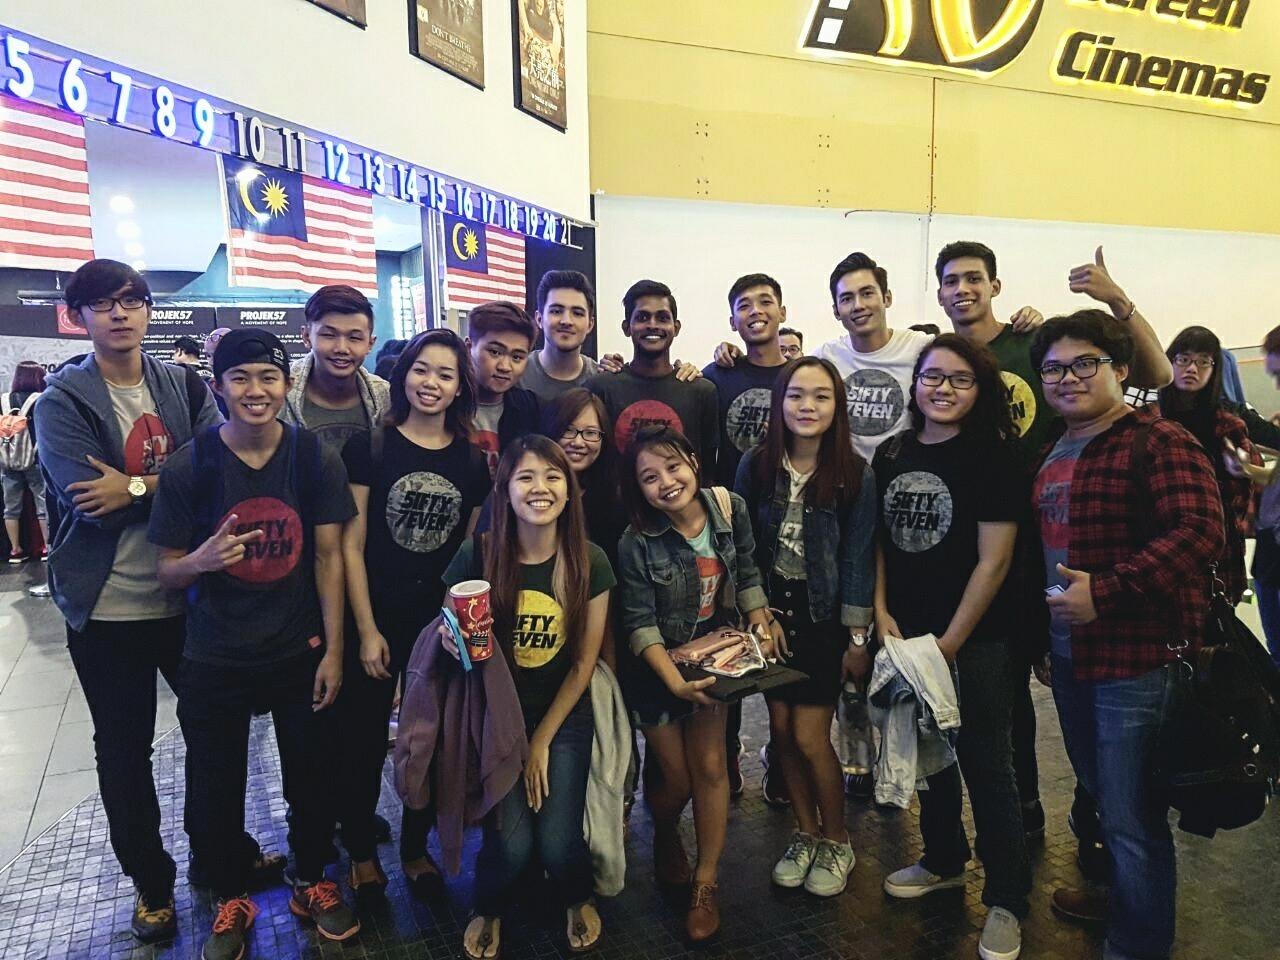 IACT College – Astro Shaw & Golden Screen Cinemas